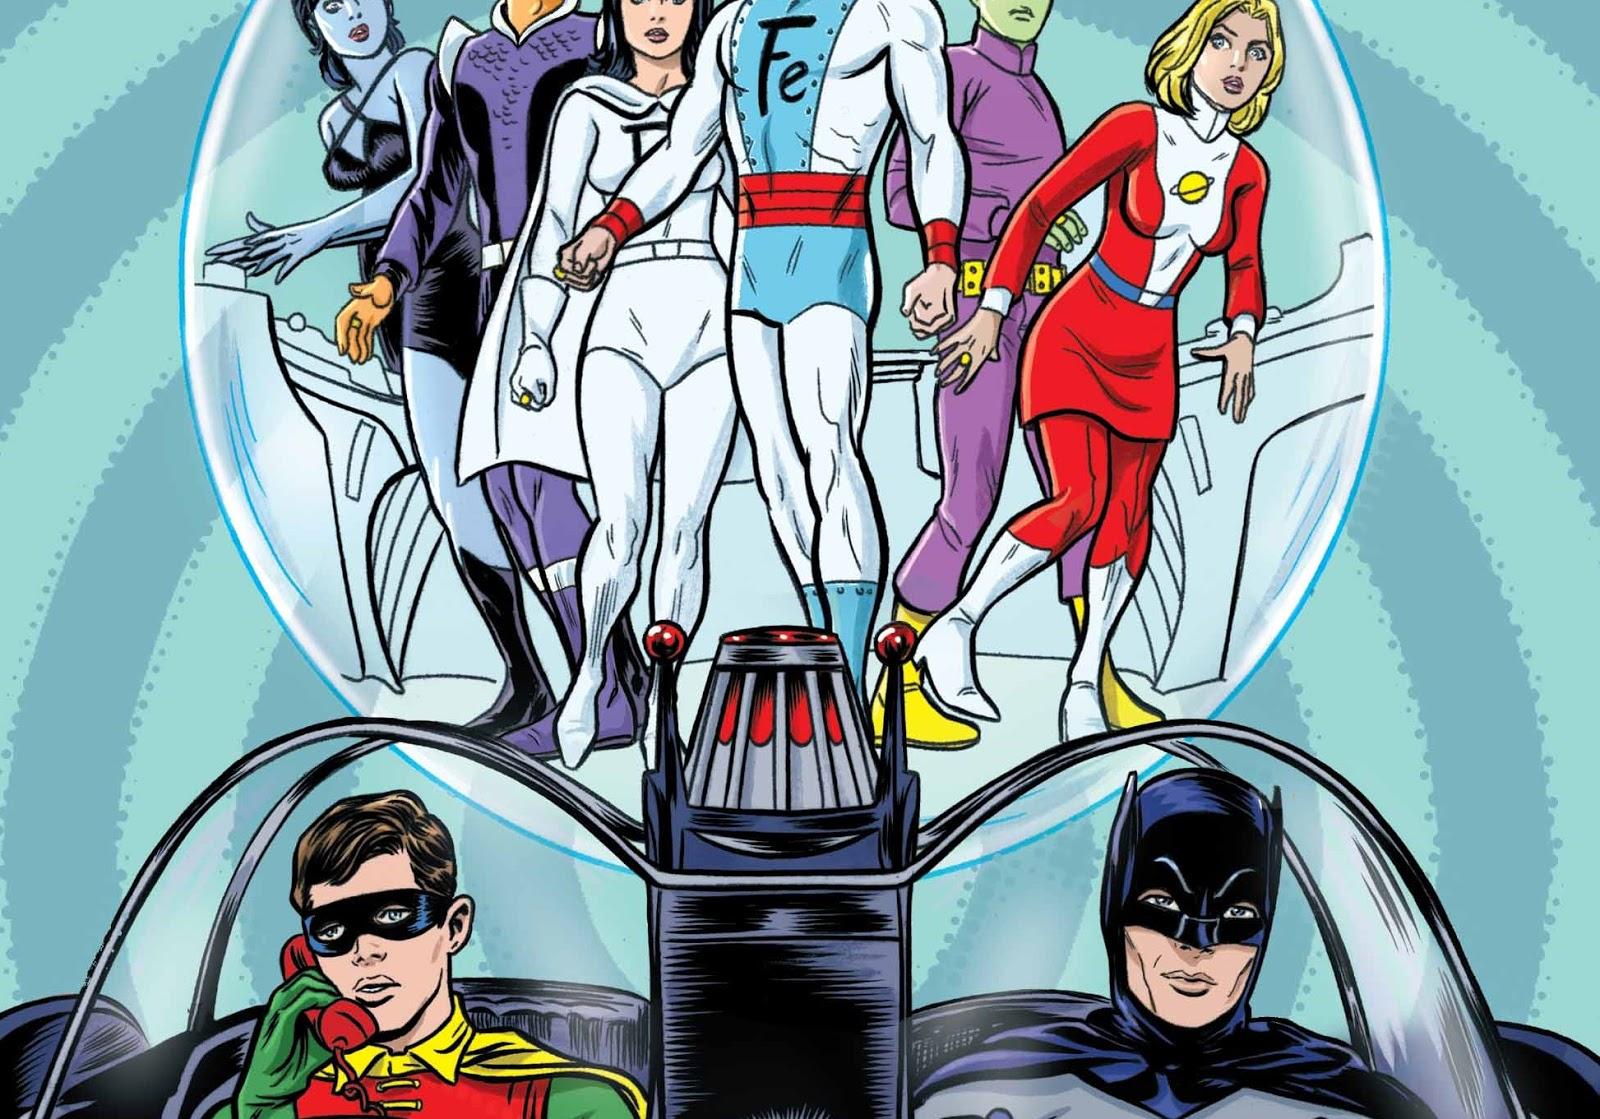 Something also Legion of super heroes xxx brilliant idea